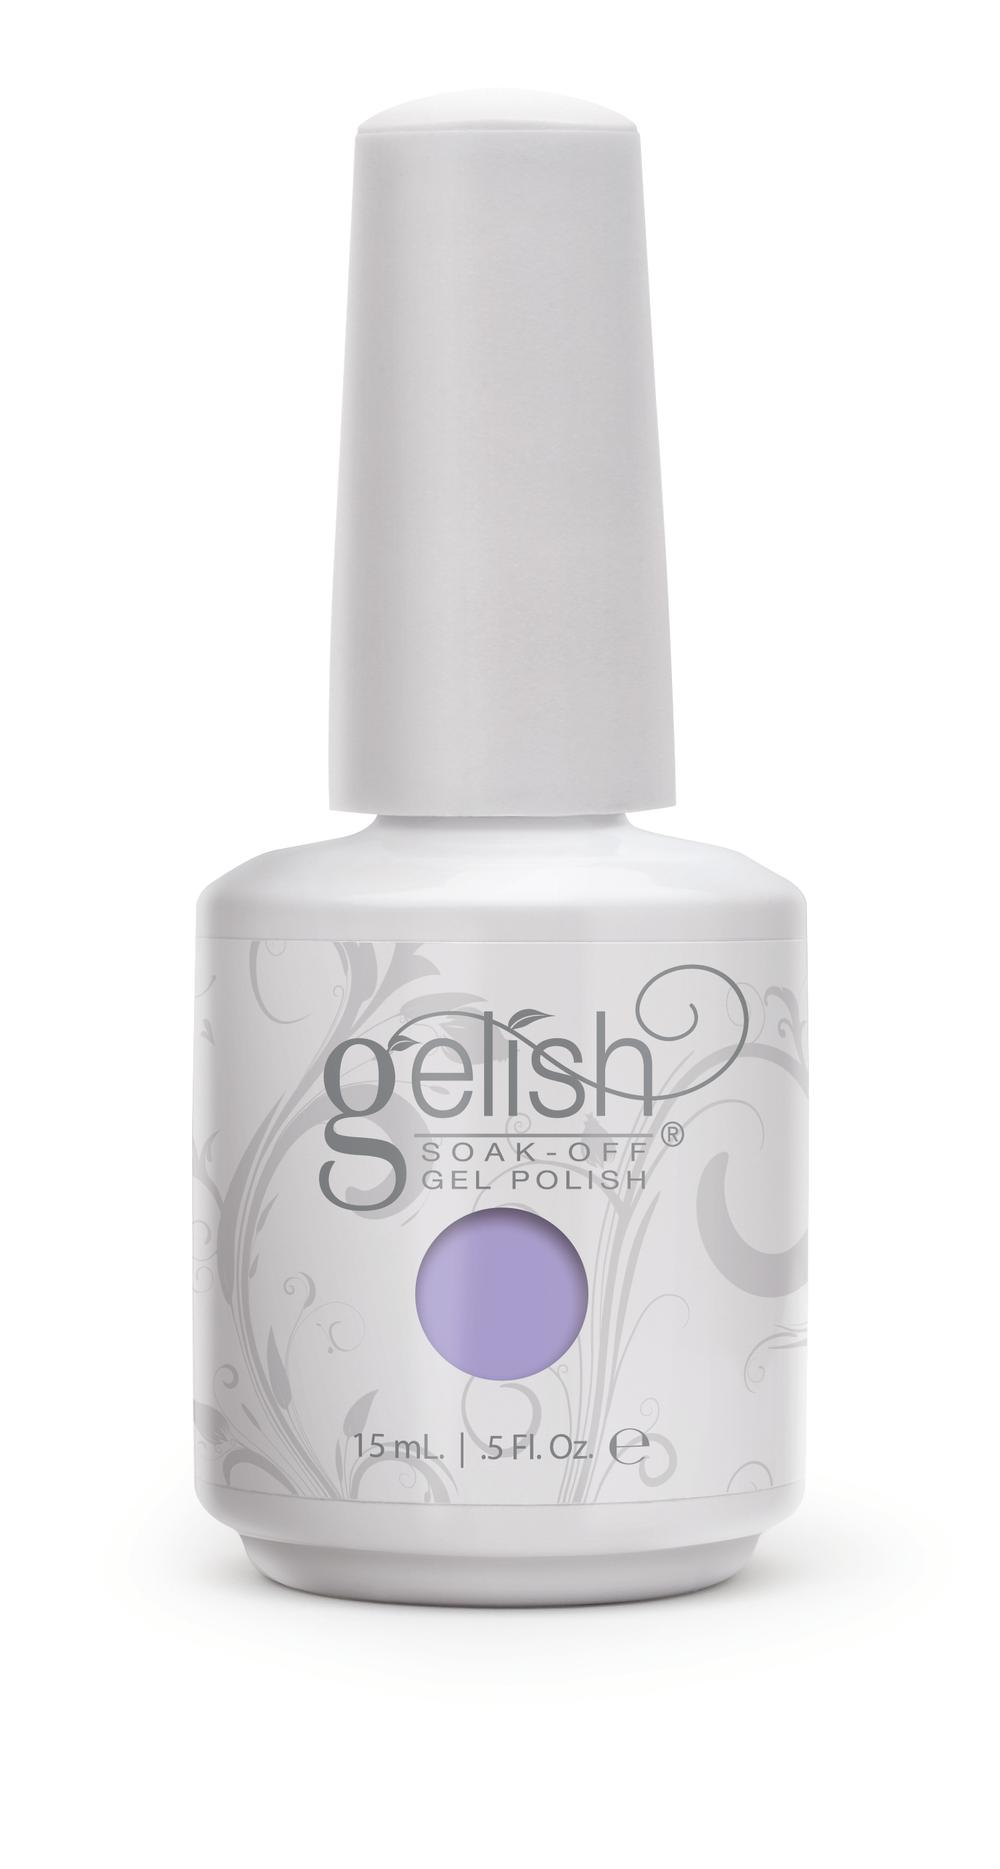 "<p><a href=""http://gelish.com/"">Gelish</a> PoRiwinkle</p>"